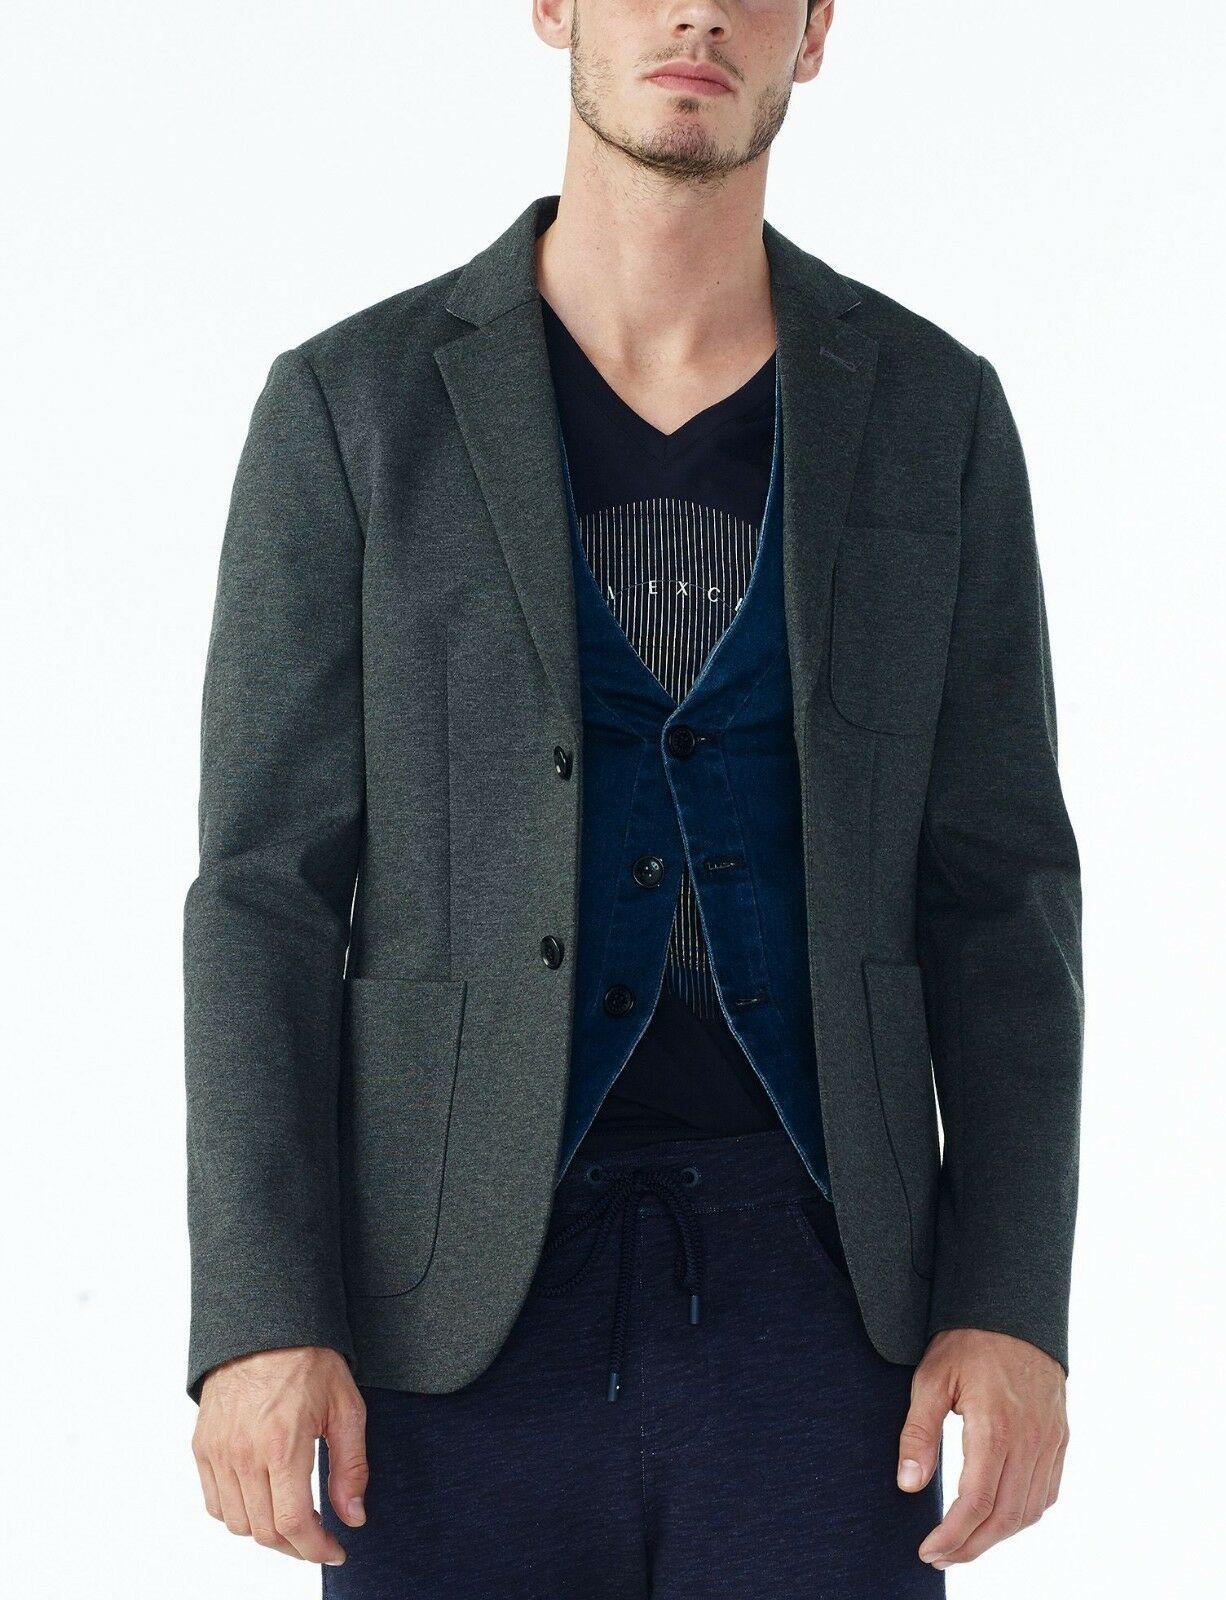 Armani Exchange Authentic Essential Ponte Blazer Gray NWT - $59.99